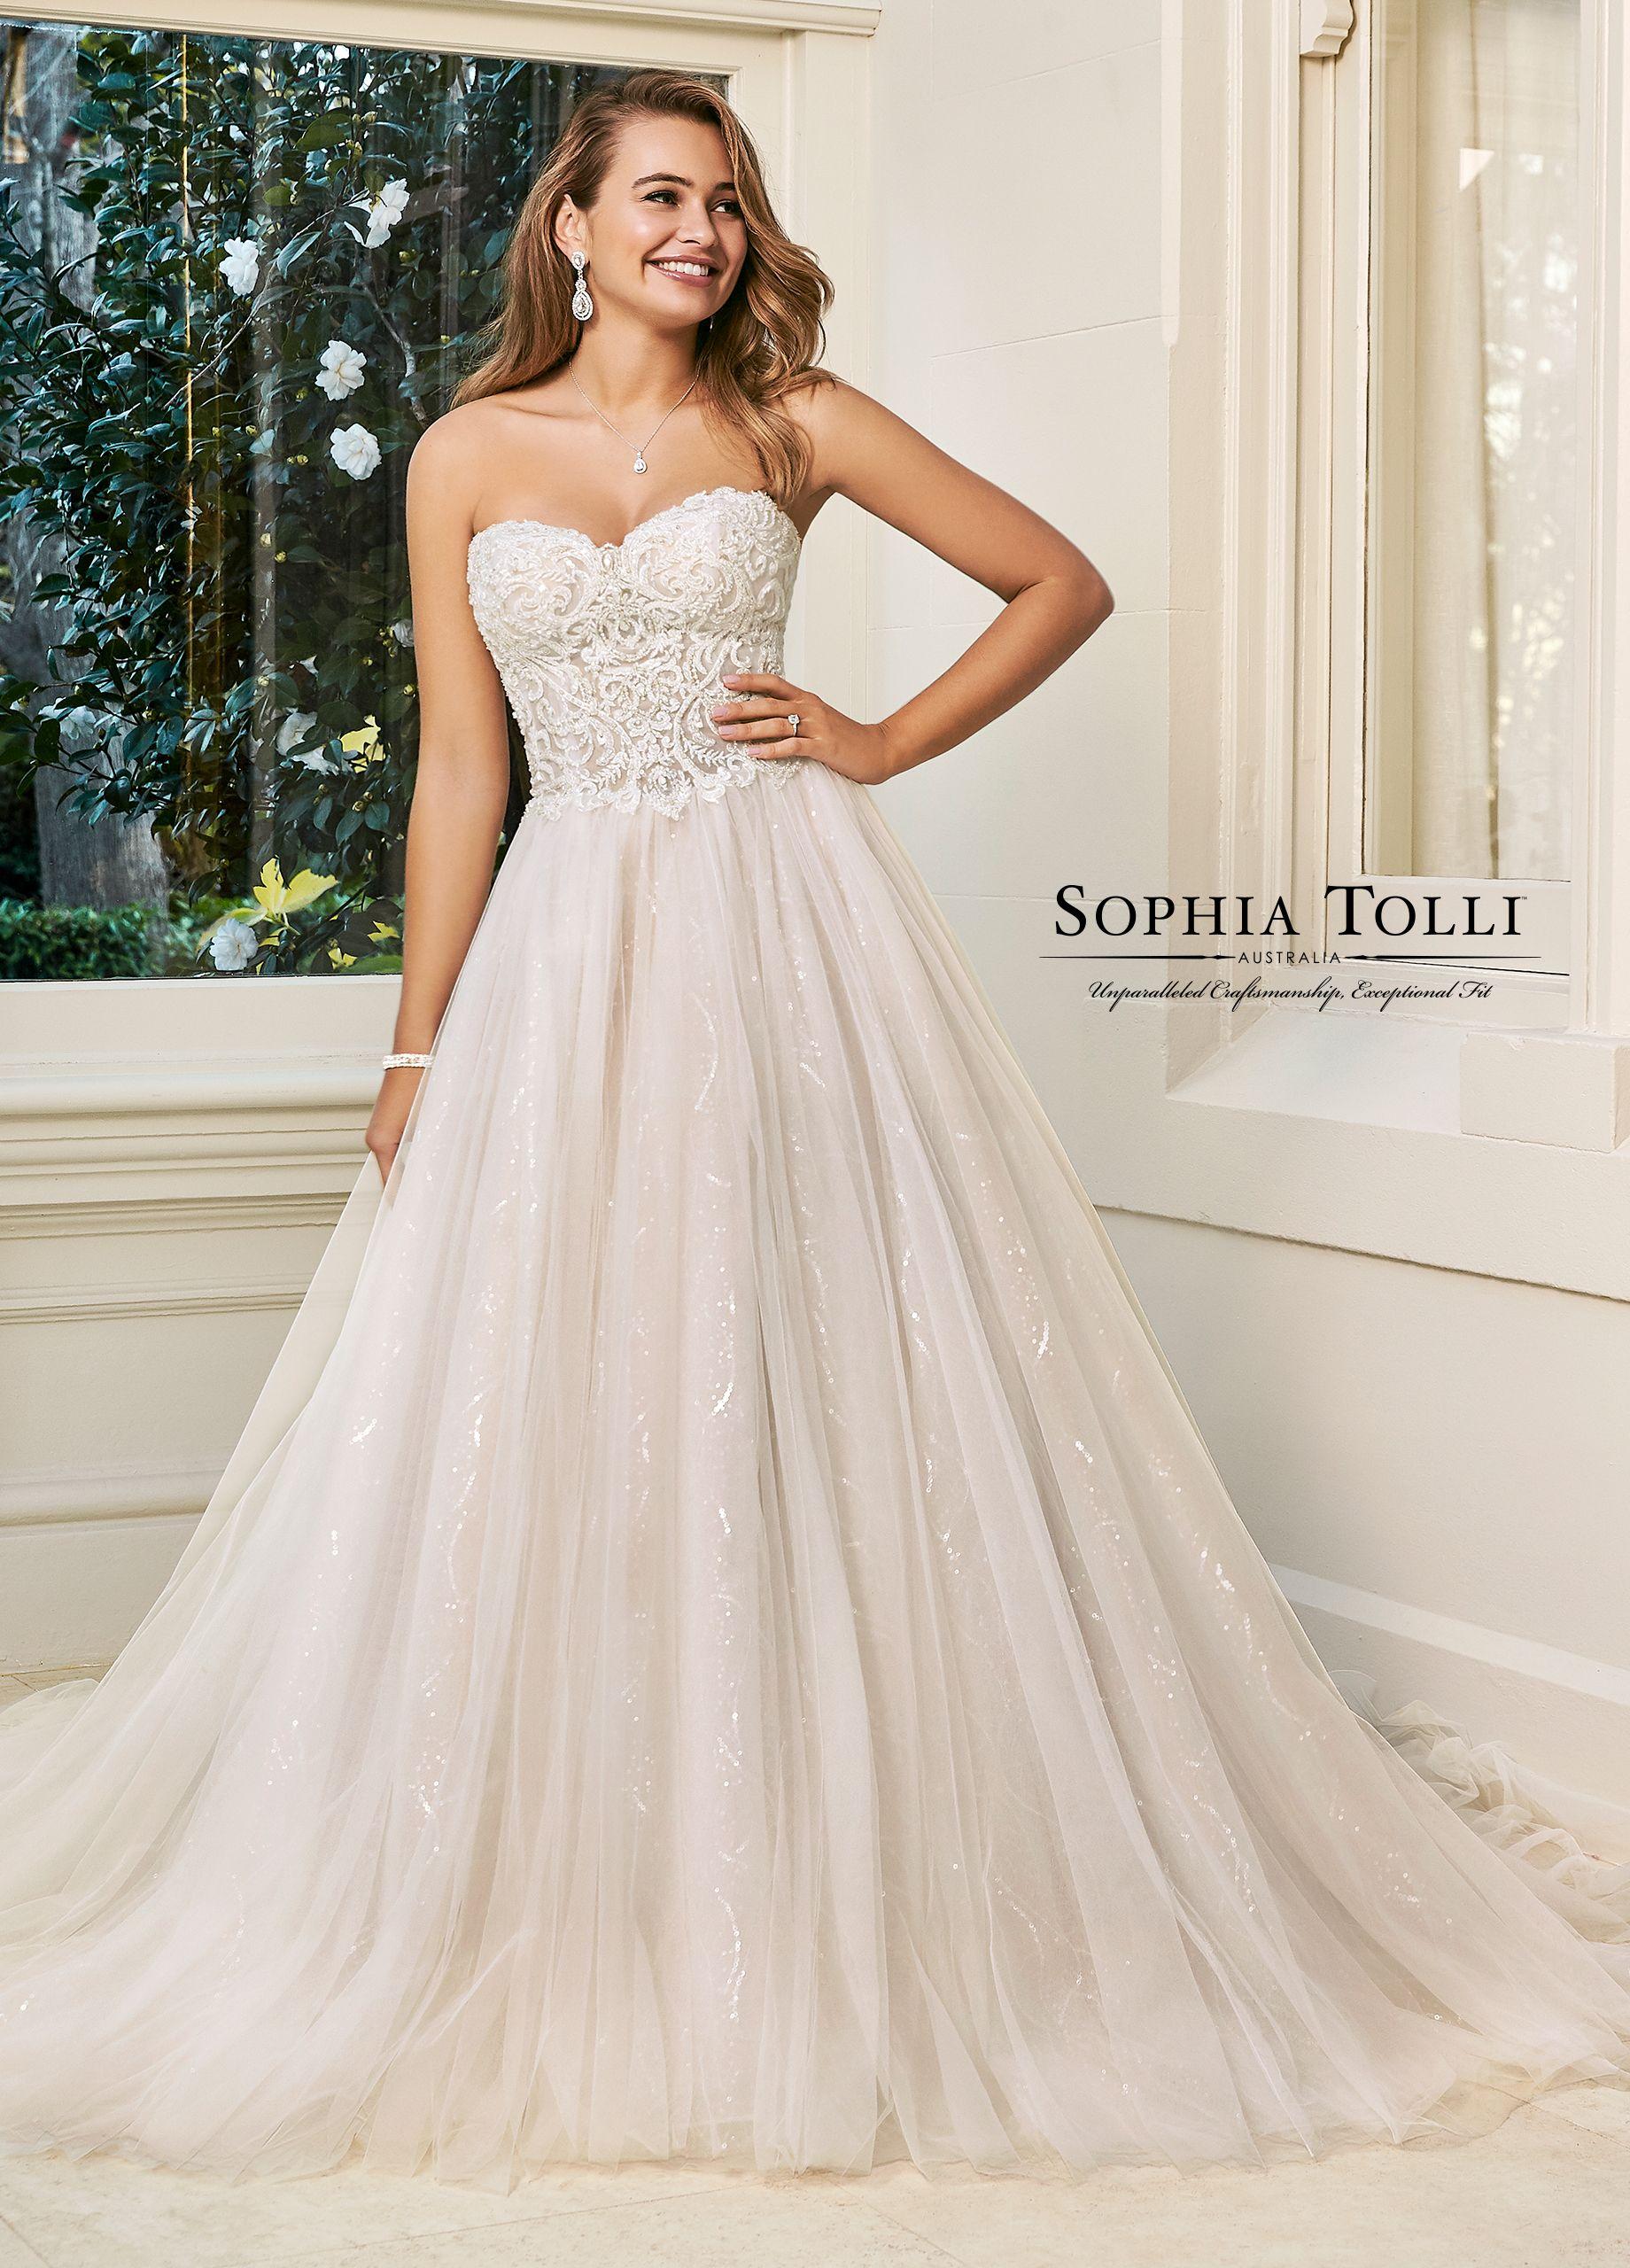 Sophia Tolli Alessia Top Wedding Dresses Sophia Tolli Wedding Dresses Wedding Dresses